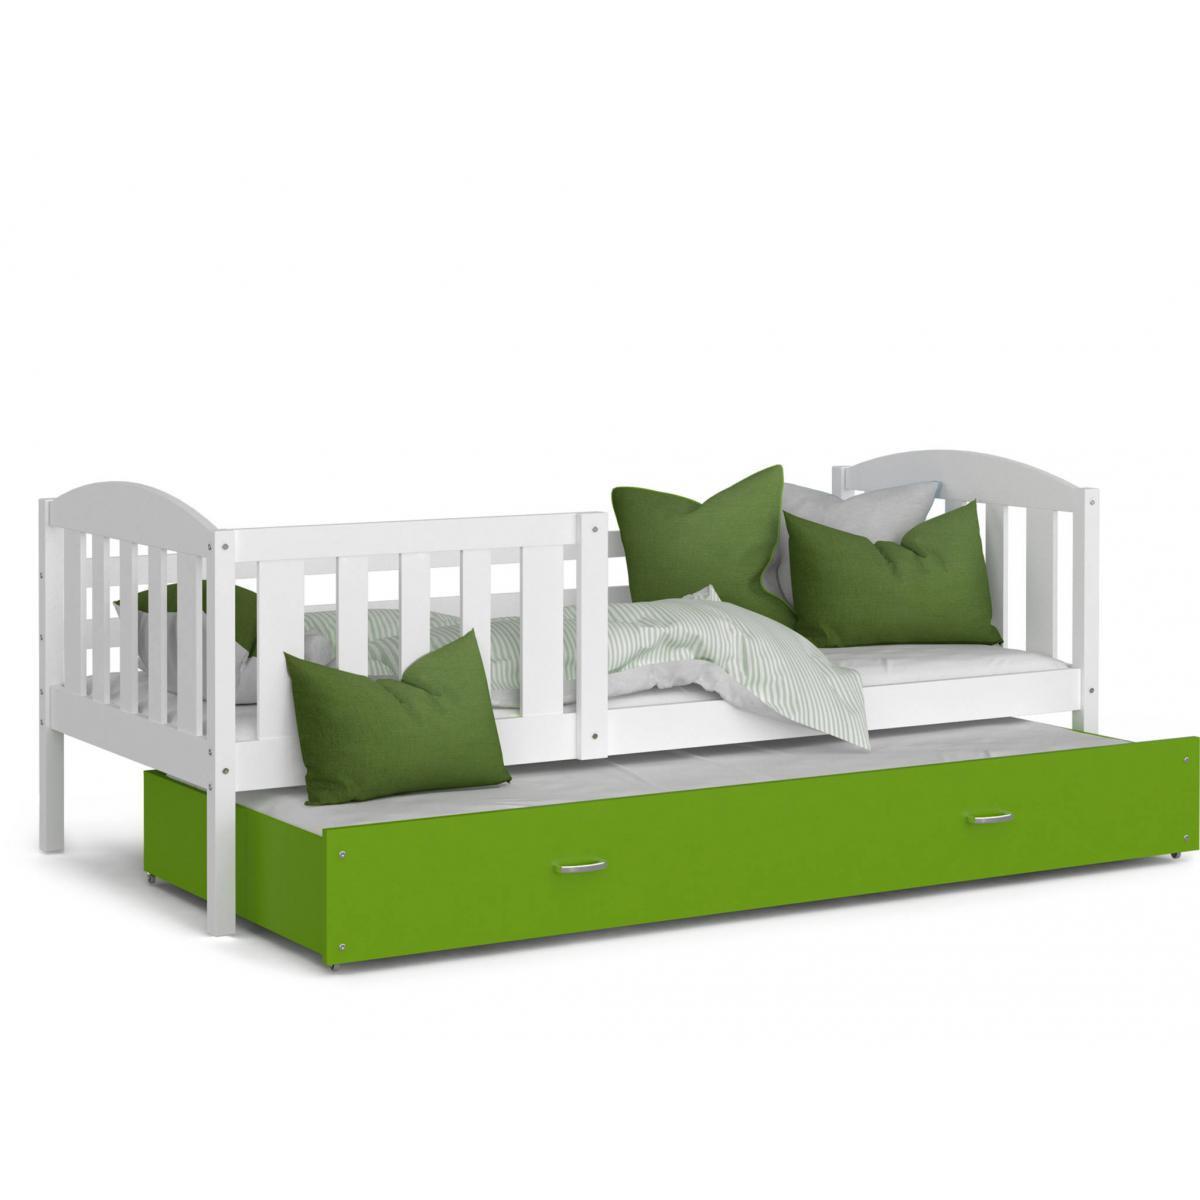 Kids Literie LIT Gigogne Teo 90x190 Blanc - Vert livré avec sommier, tiroir et matelas de 7cm OFFERT.